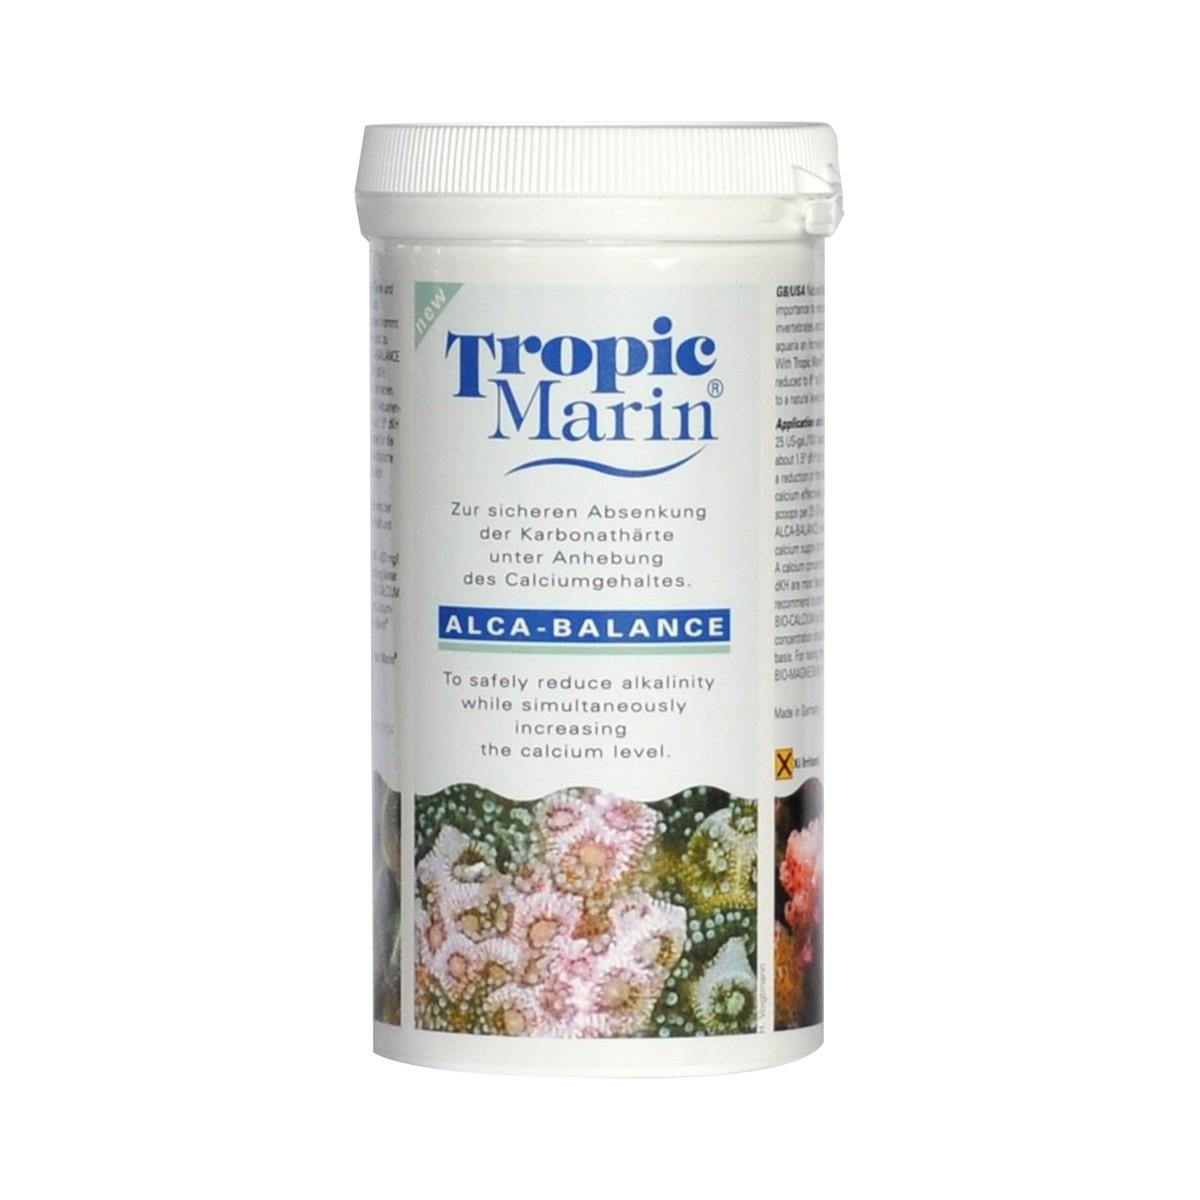 Reduz Alcalinidade e Aumenta Cálcio TROPIC MARIN ALCA BALANCE 400G